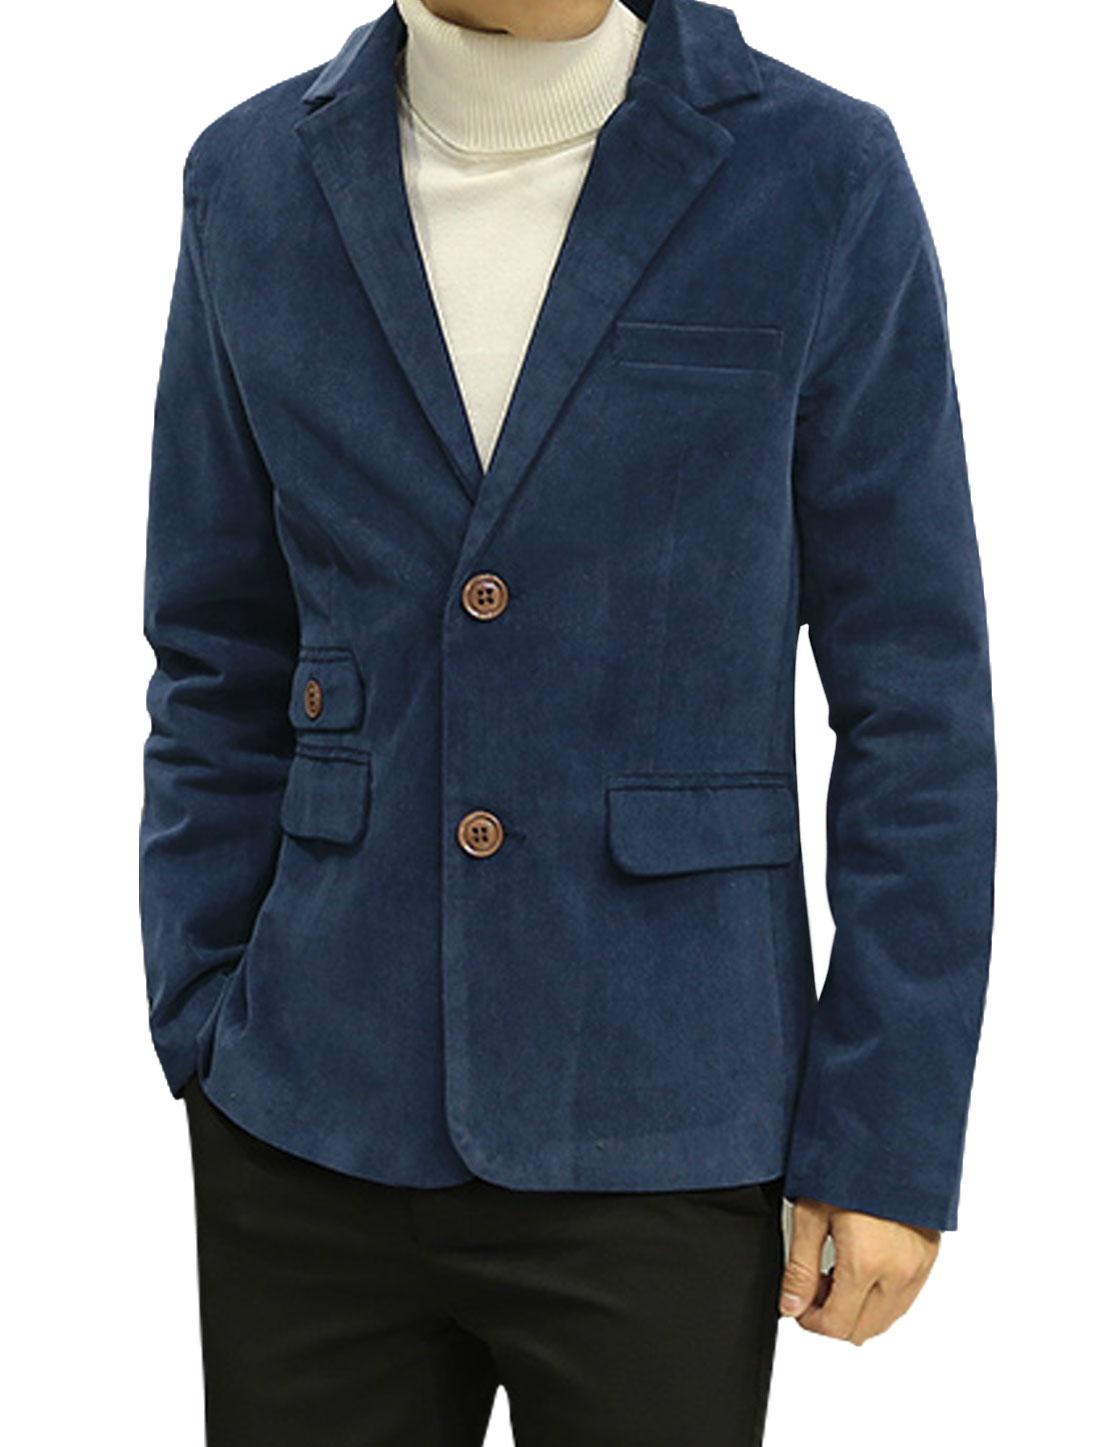 Men Notched Lapel Multi Pockets Split Sides Corduroy Blazer Jacket Blue S